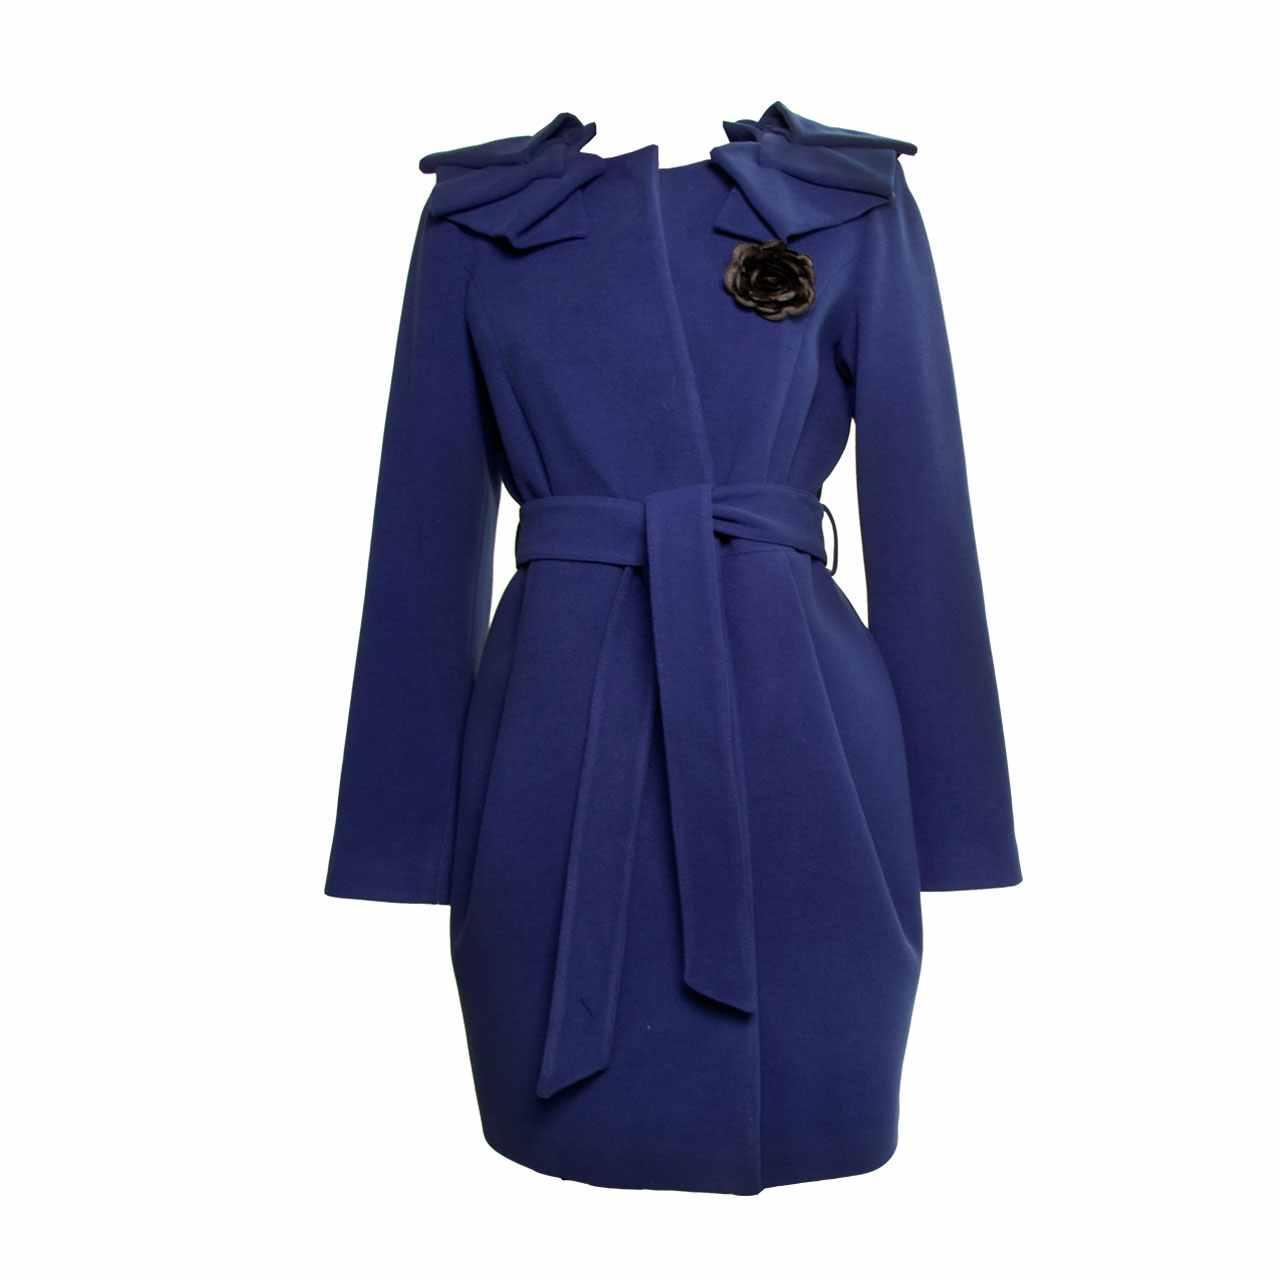 208661 Long winter coats